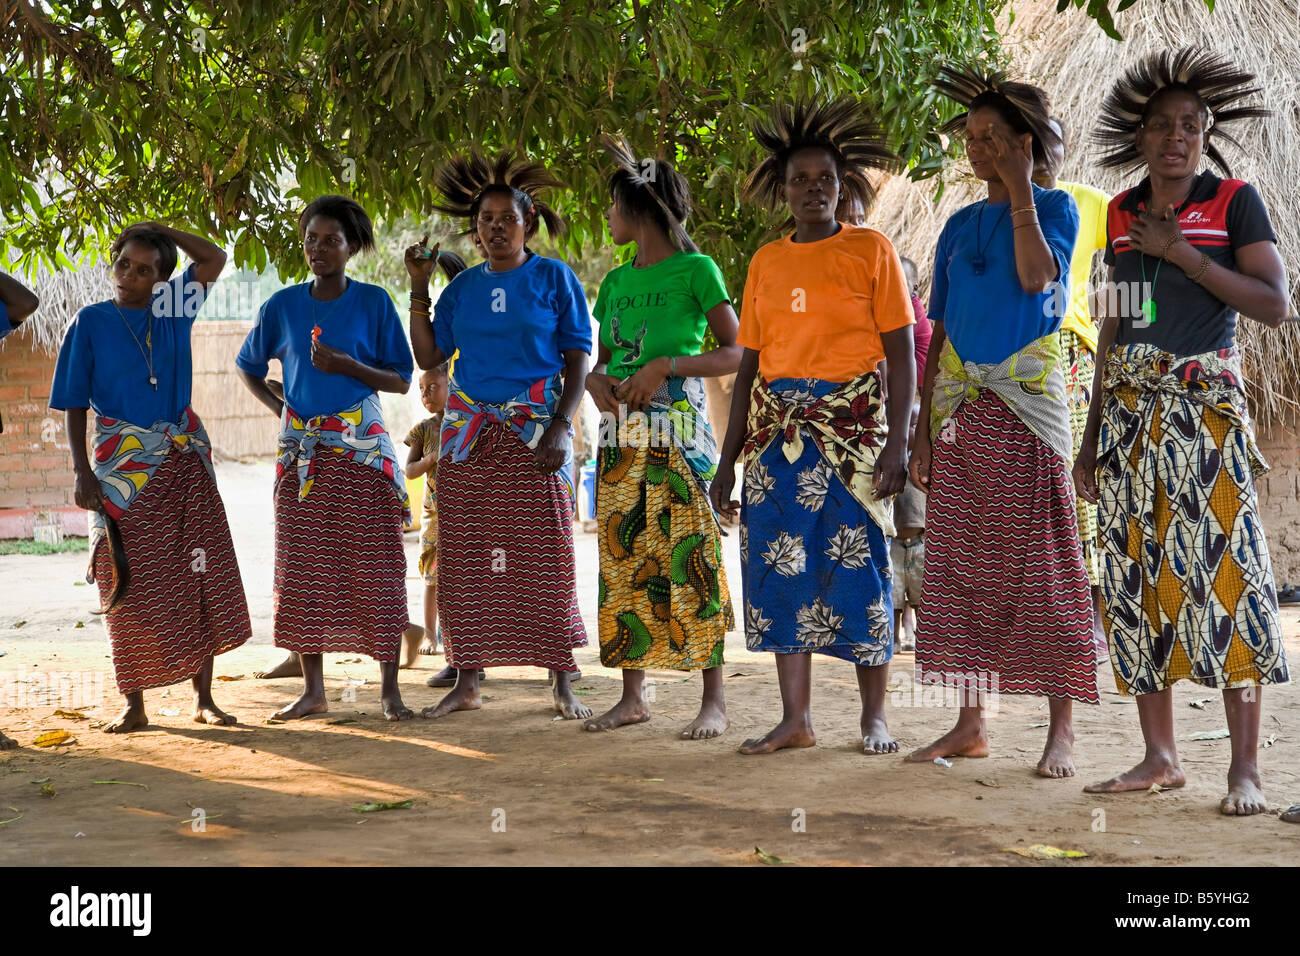 Dancers at Kawaza Village in Zambia - Stock Image